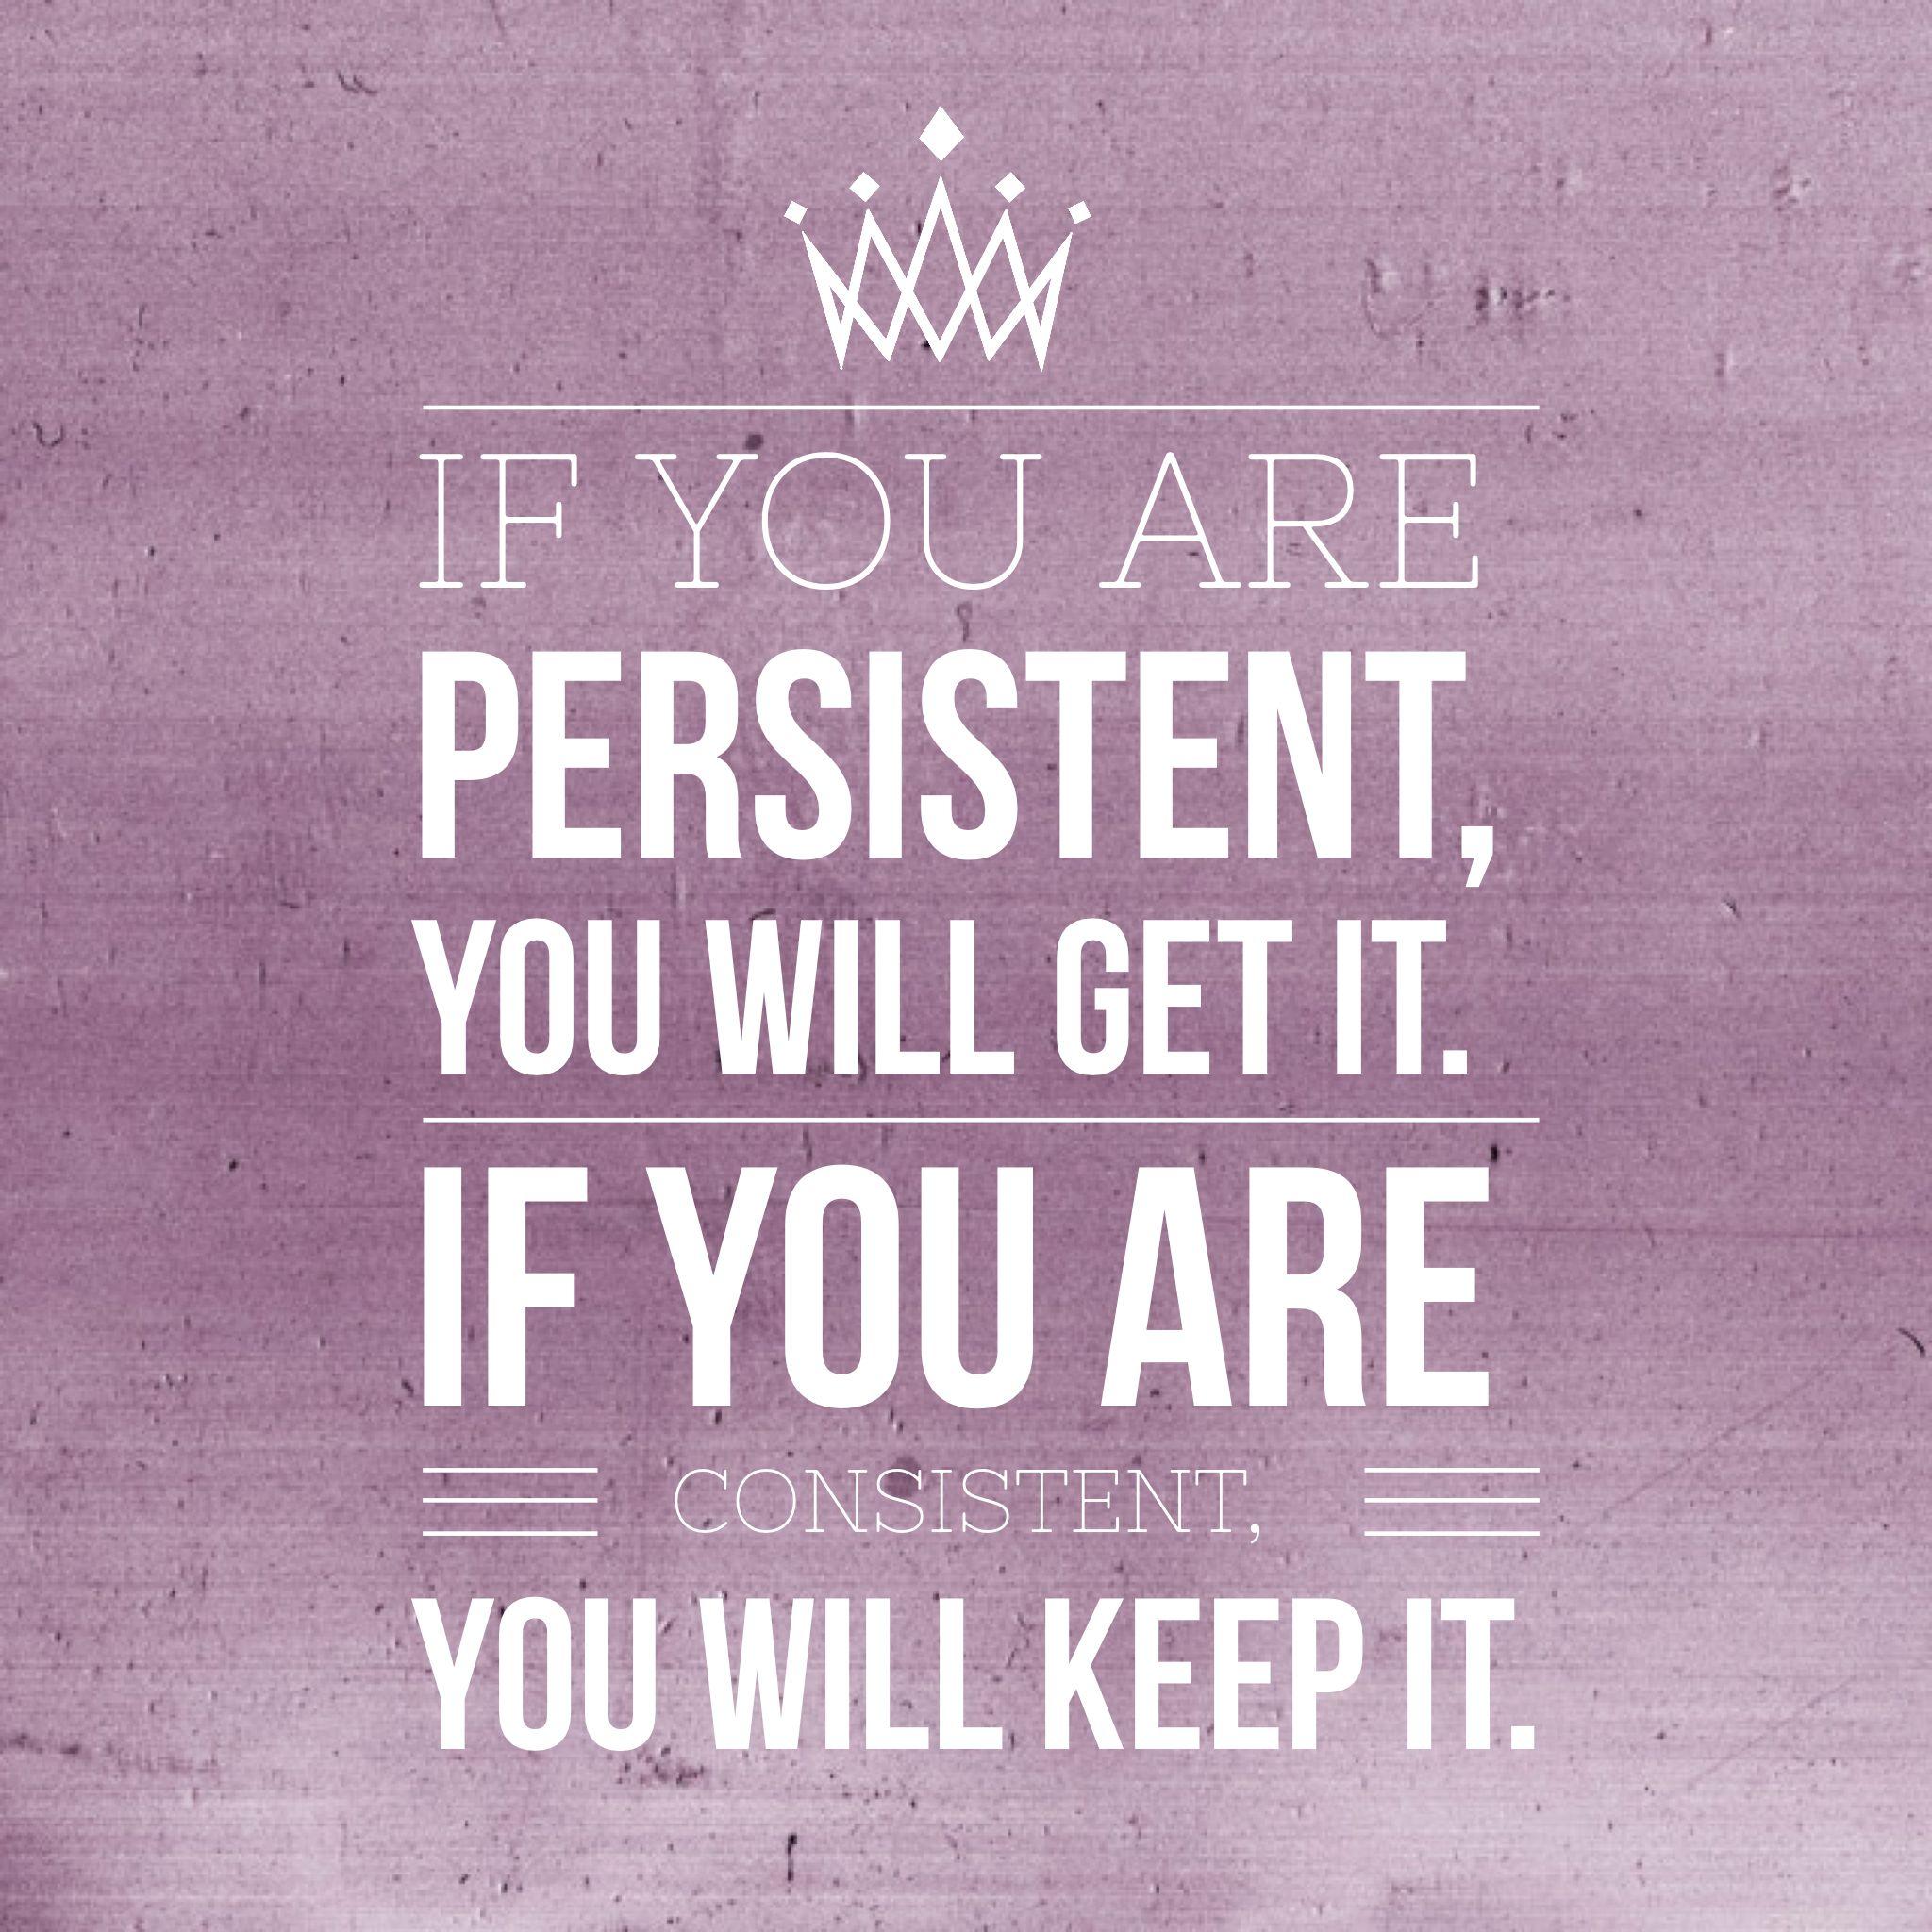 #motivation #inspiration #growth #girlboss #bossbabe #smallbusiness #goforit